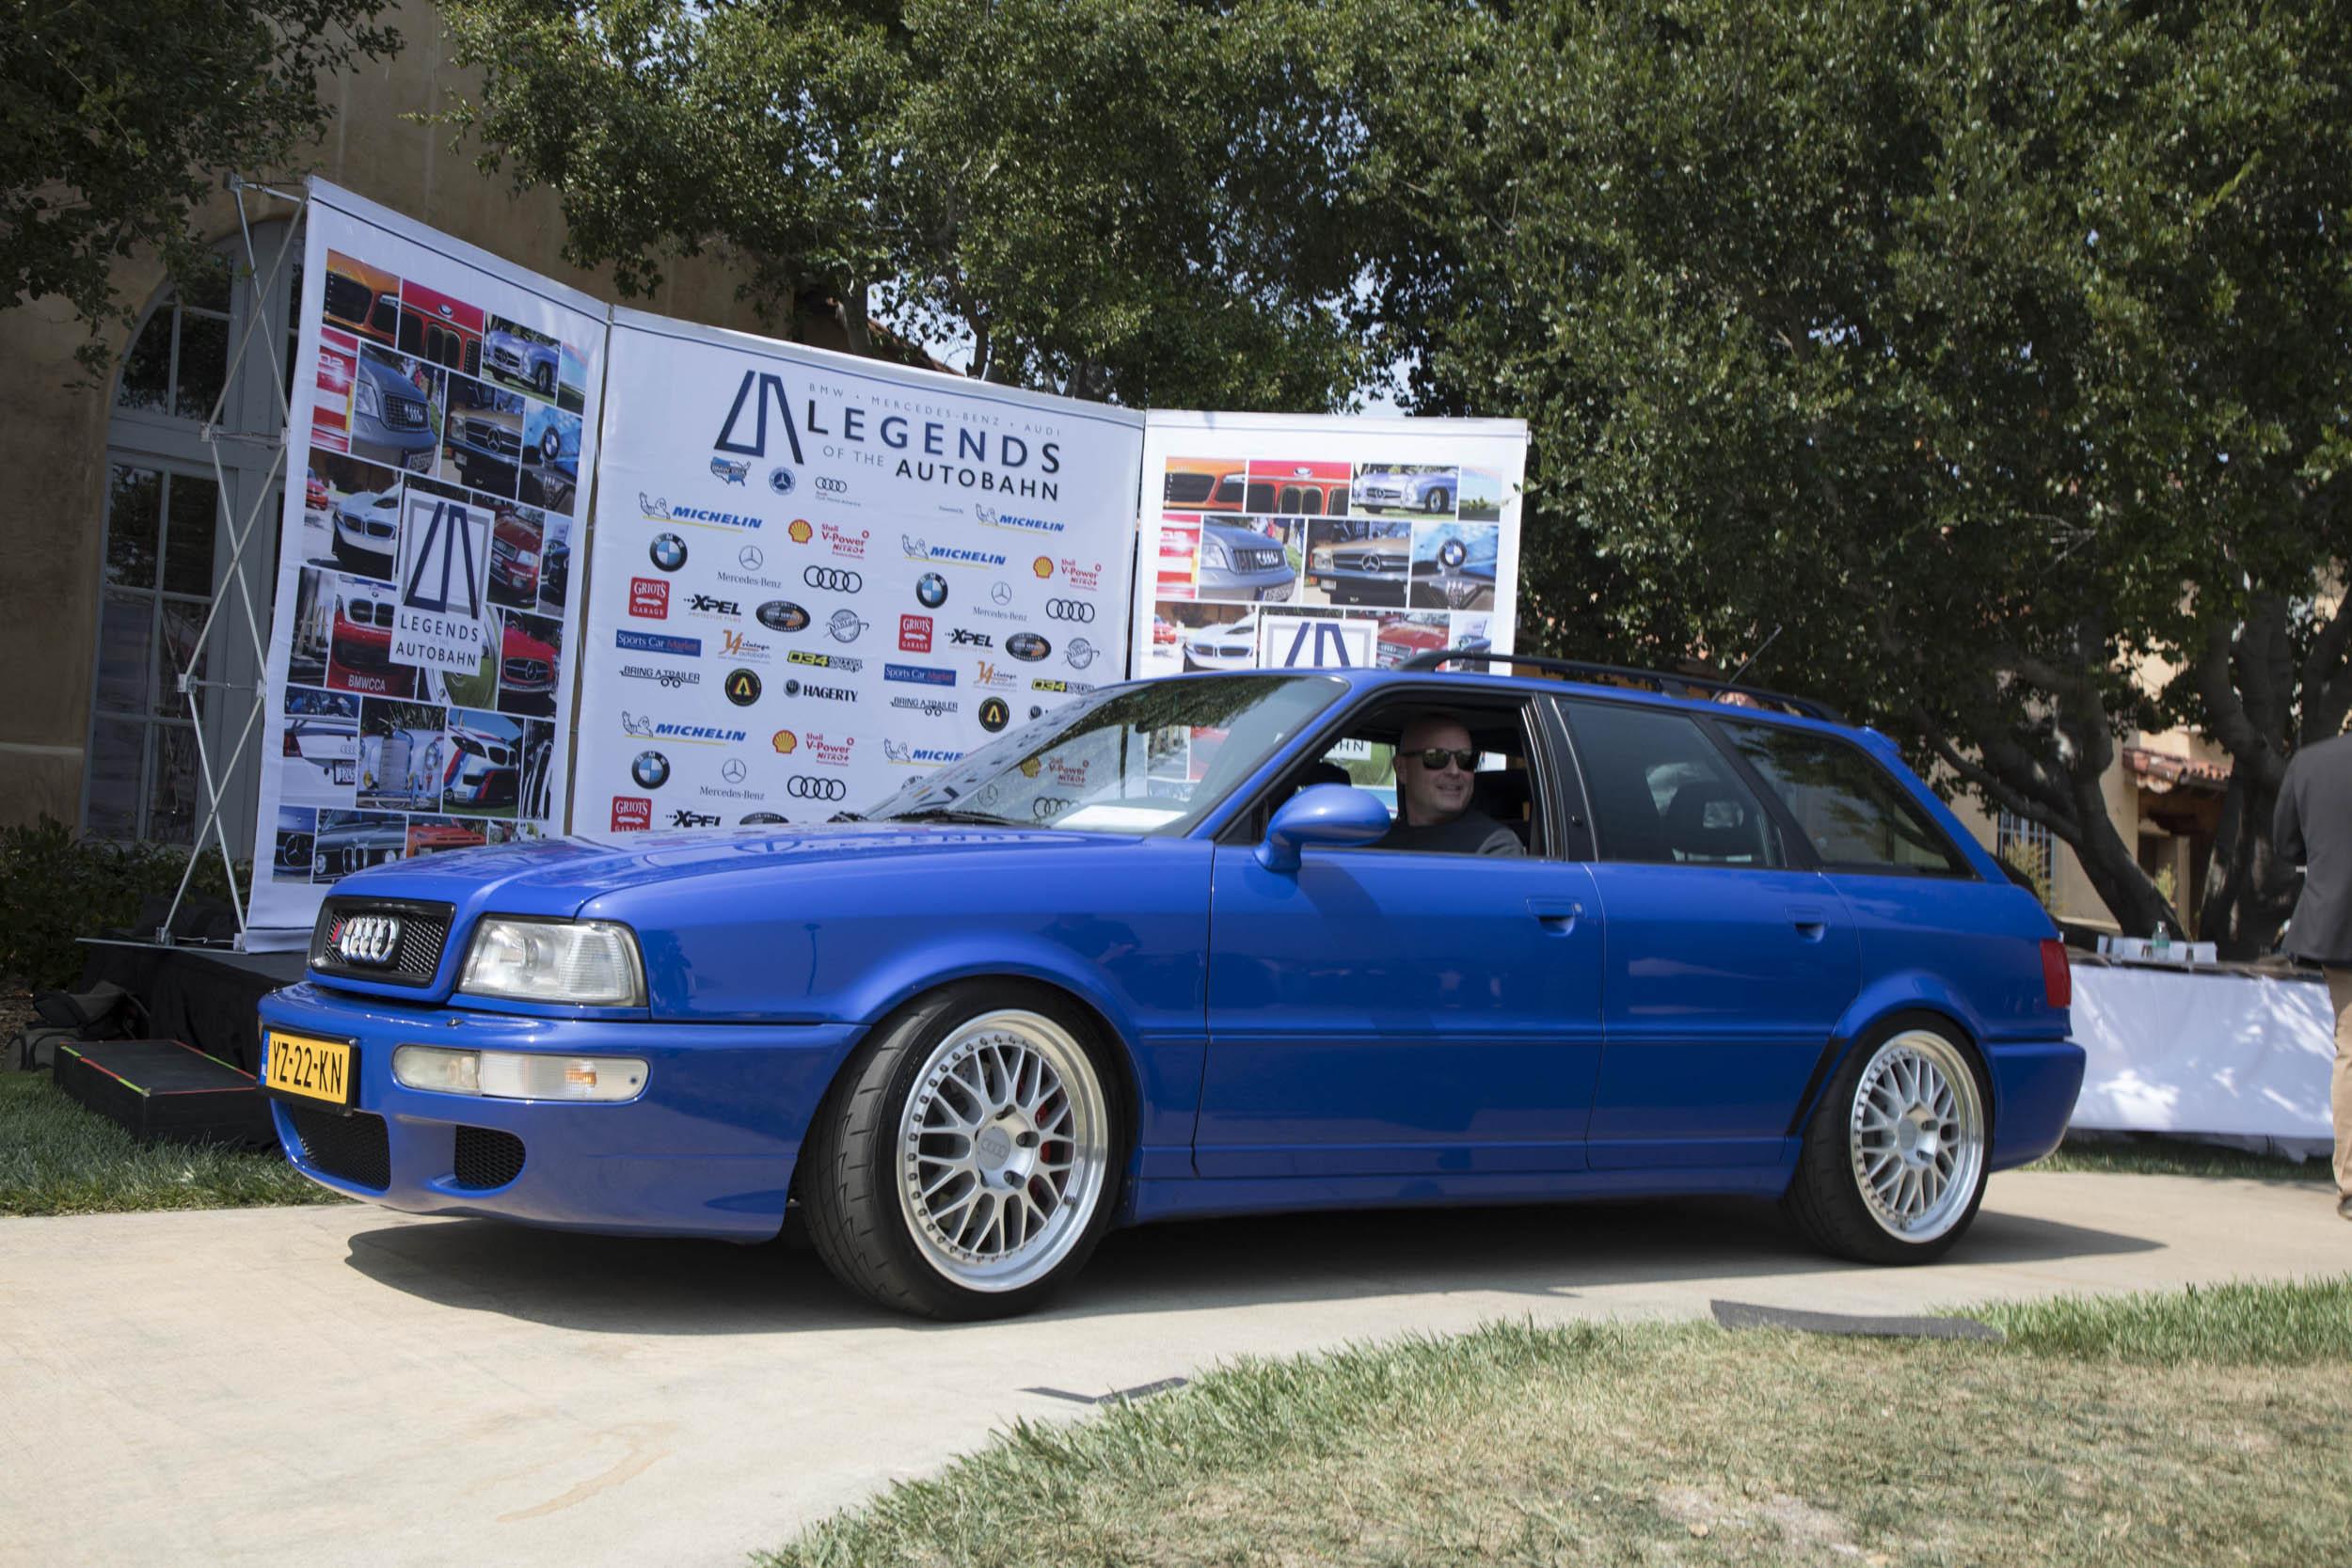 2018 Legends of the Autobahn Audi class winner